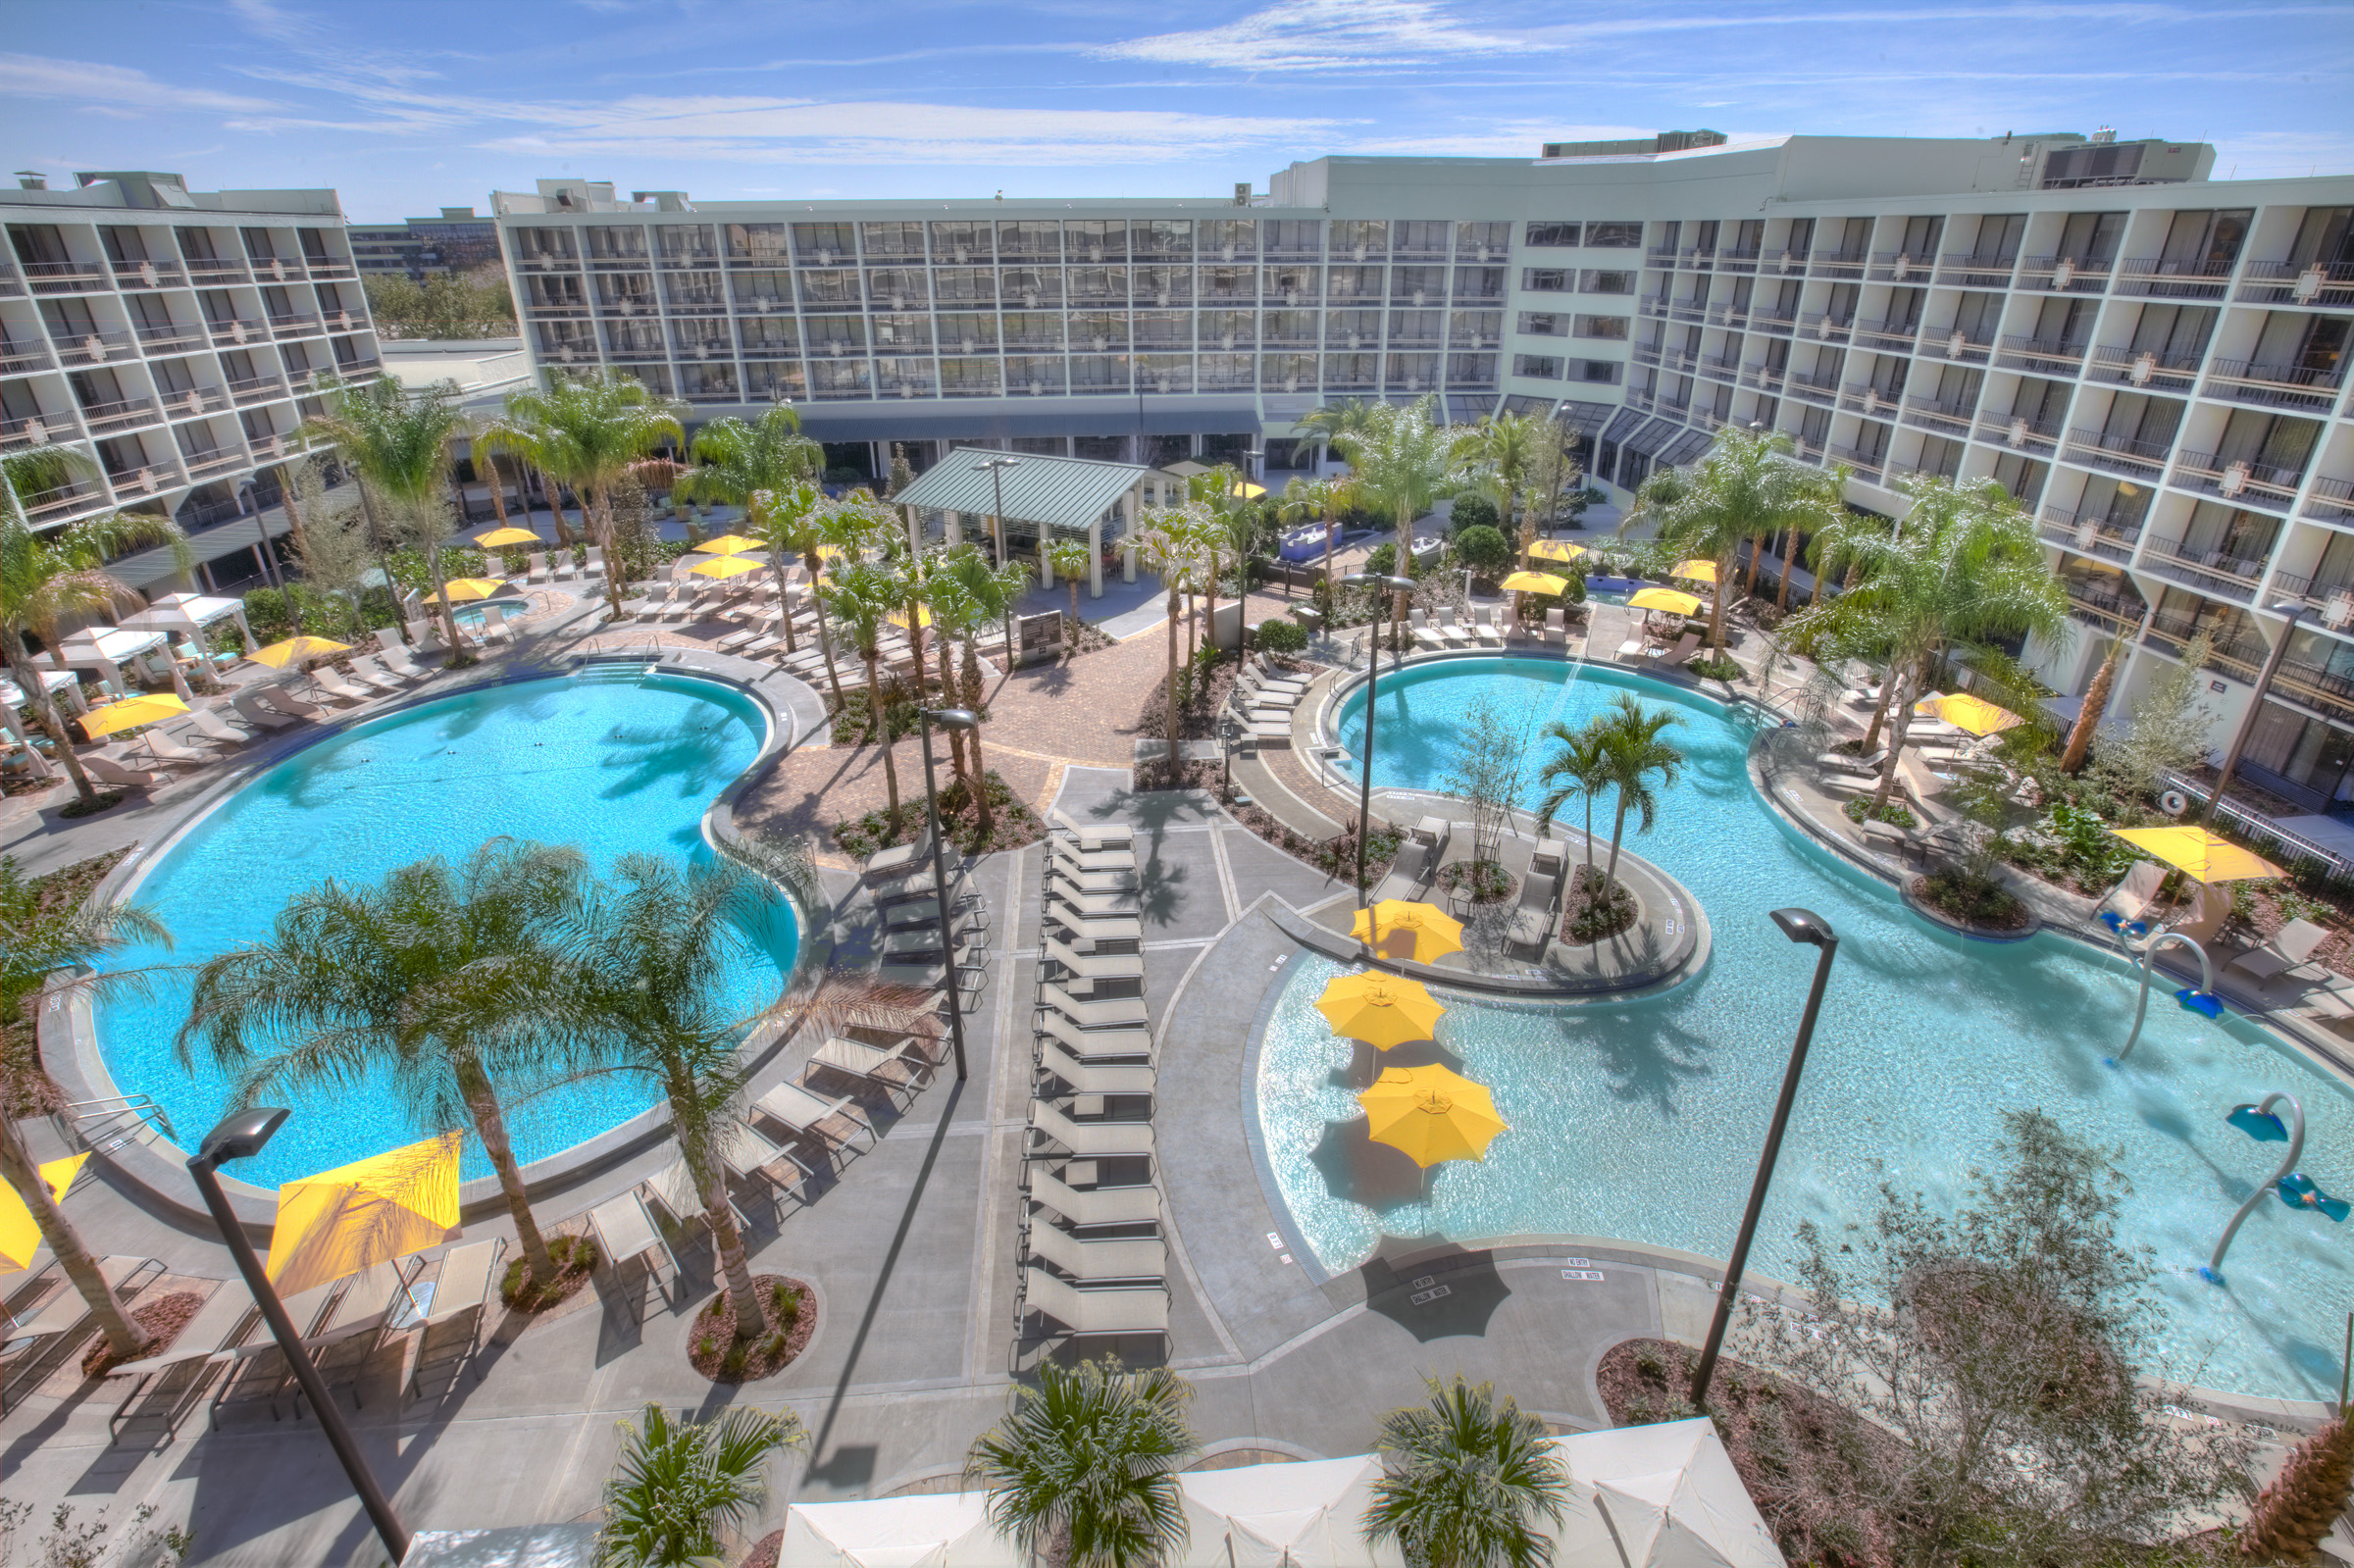 New Sheraton Lake Buena Vista Resort in Orlando Offers 50